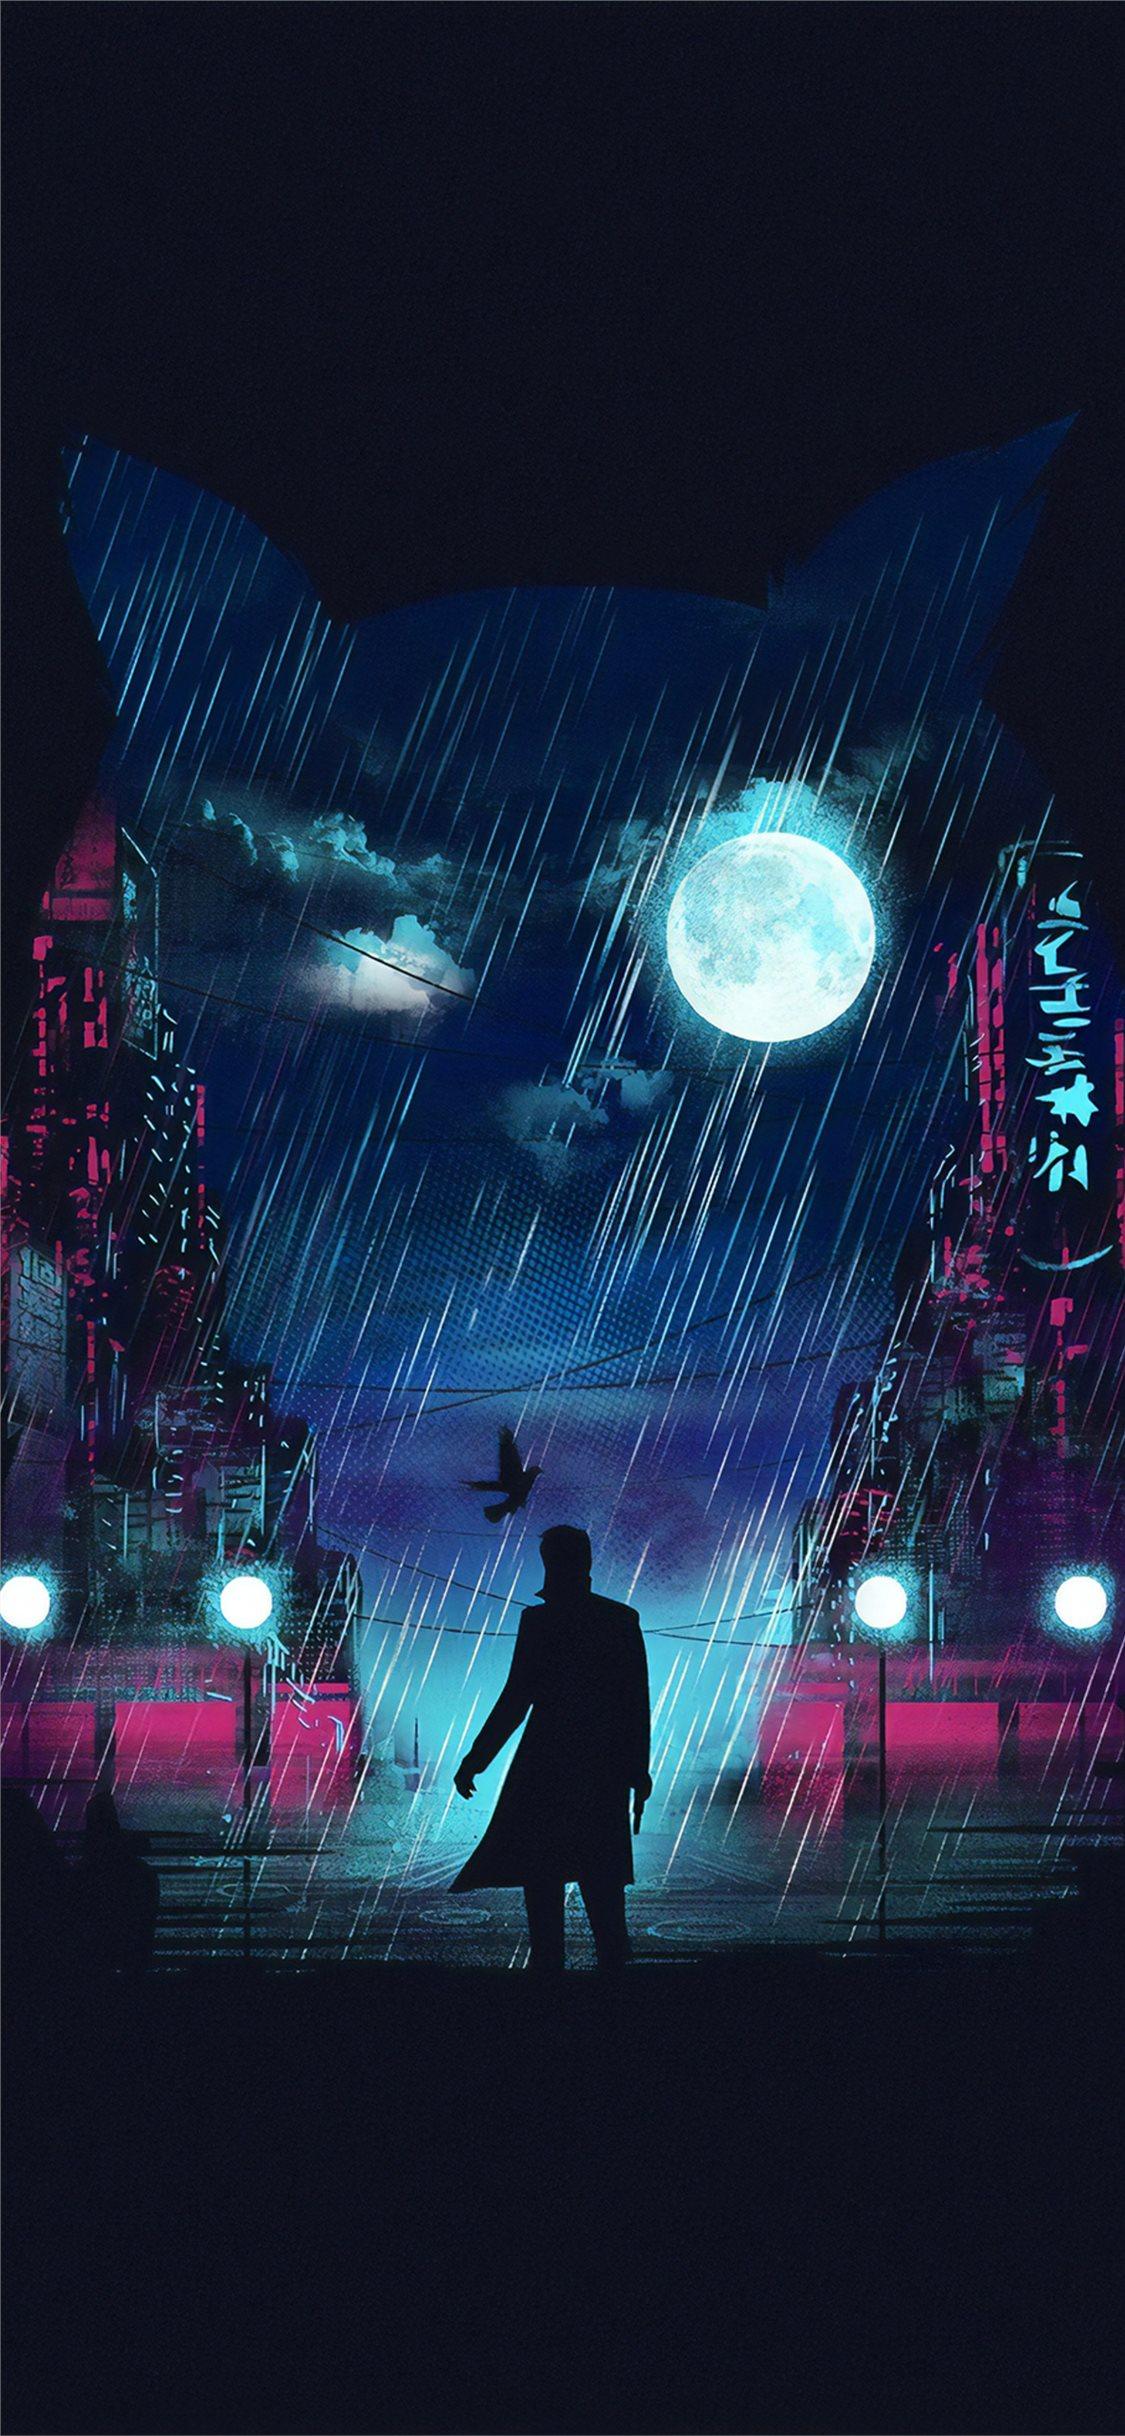 Best Blade Runner 2049 Iphone X Wallpapers Hd Ilikewallpaper